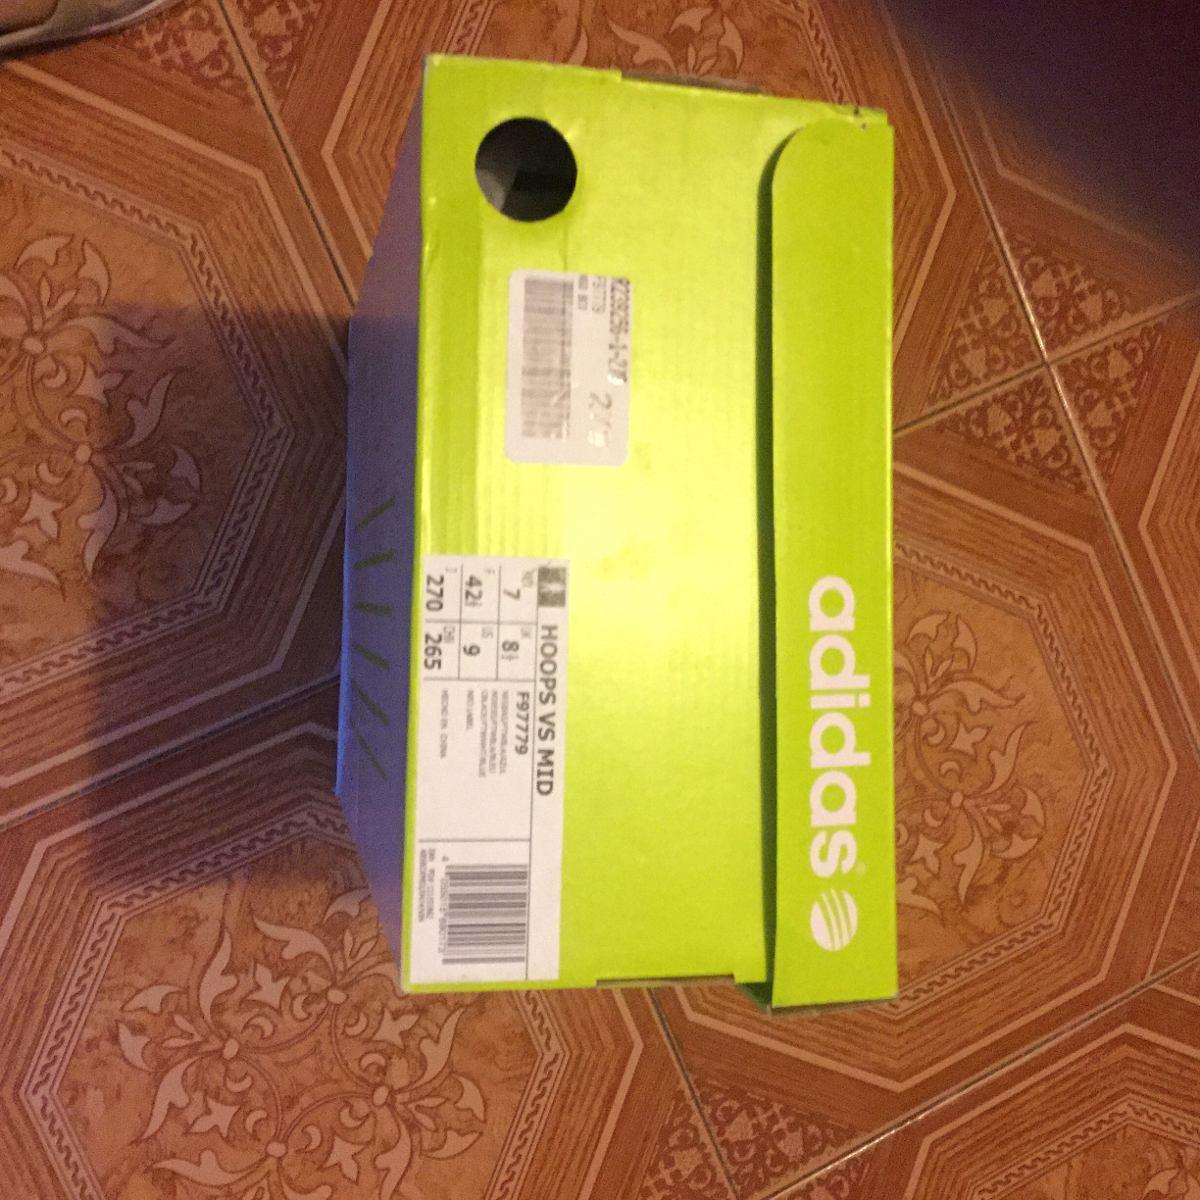 Tenis adidas Neo Hoops Vs Mid Tipo Bota -   899.00 en Mercado Libre 31fb49c25a3f0